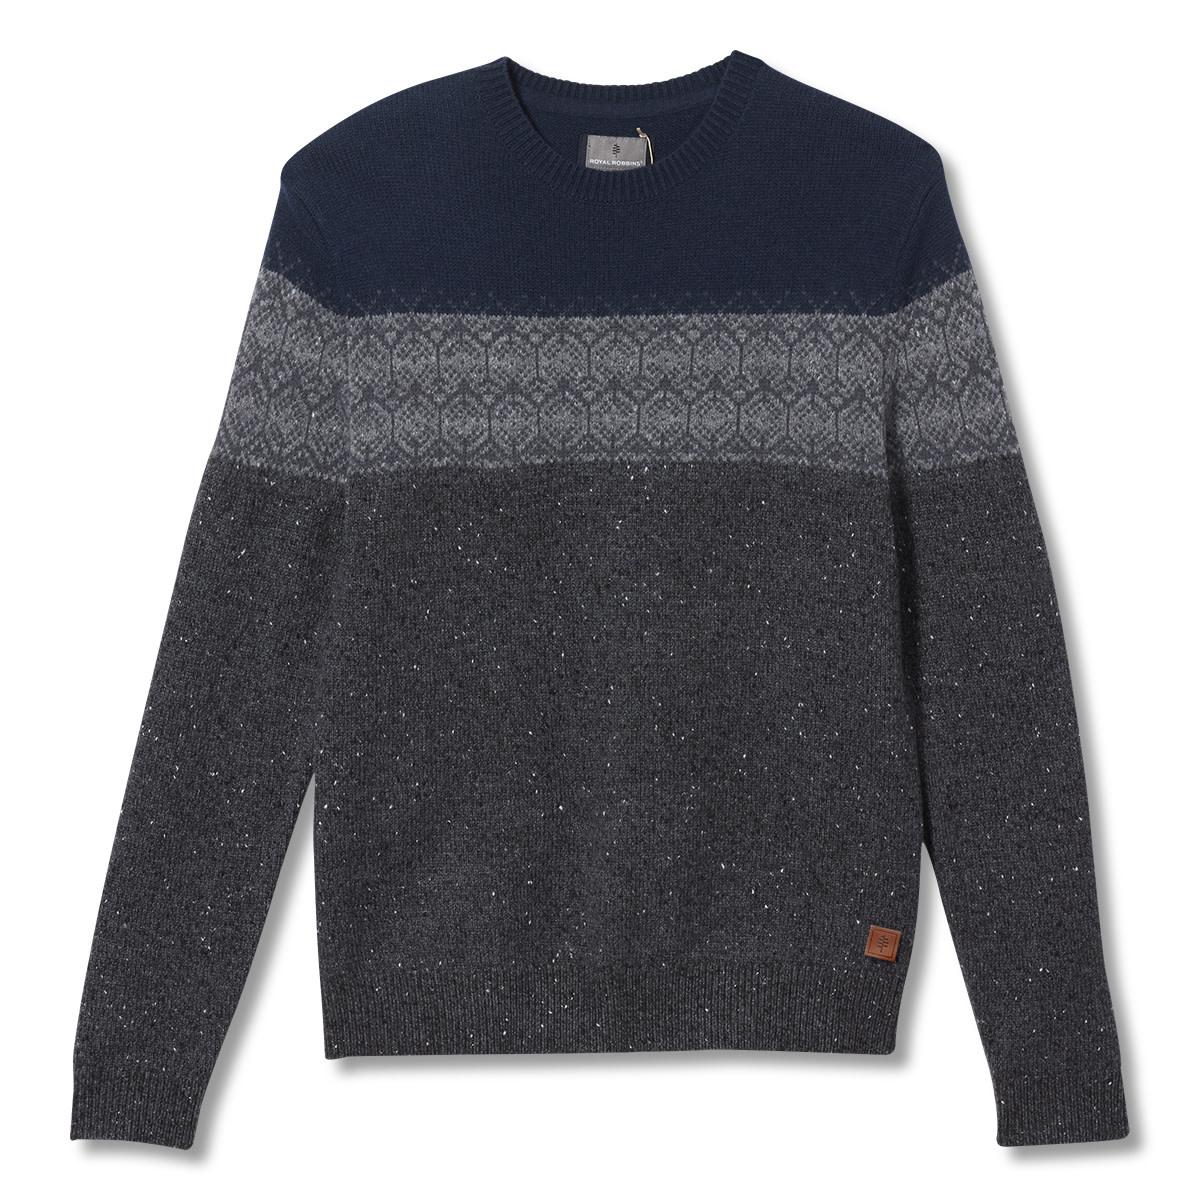 Royal Robbins Banff Novelty Sweater, Charcoal